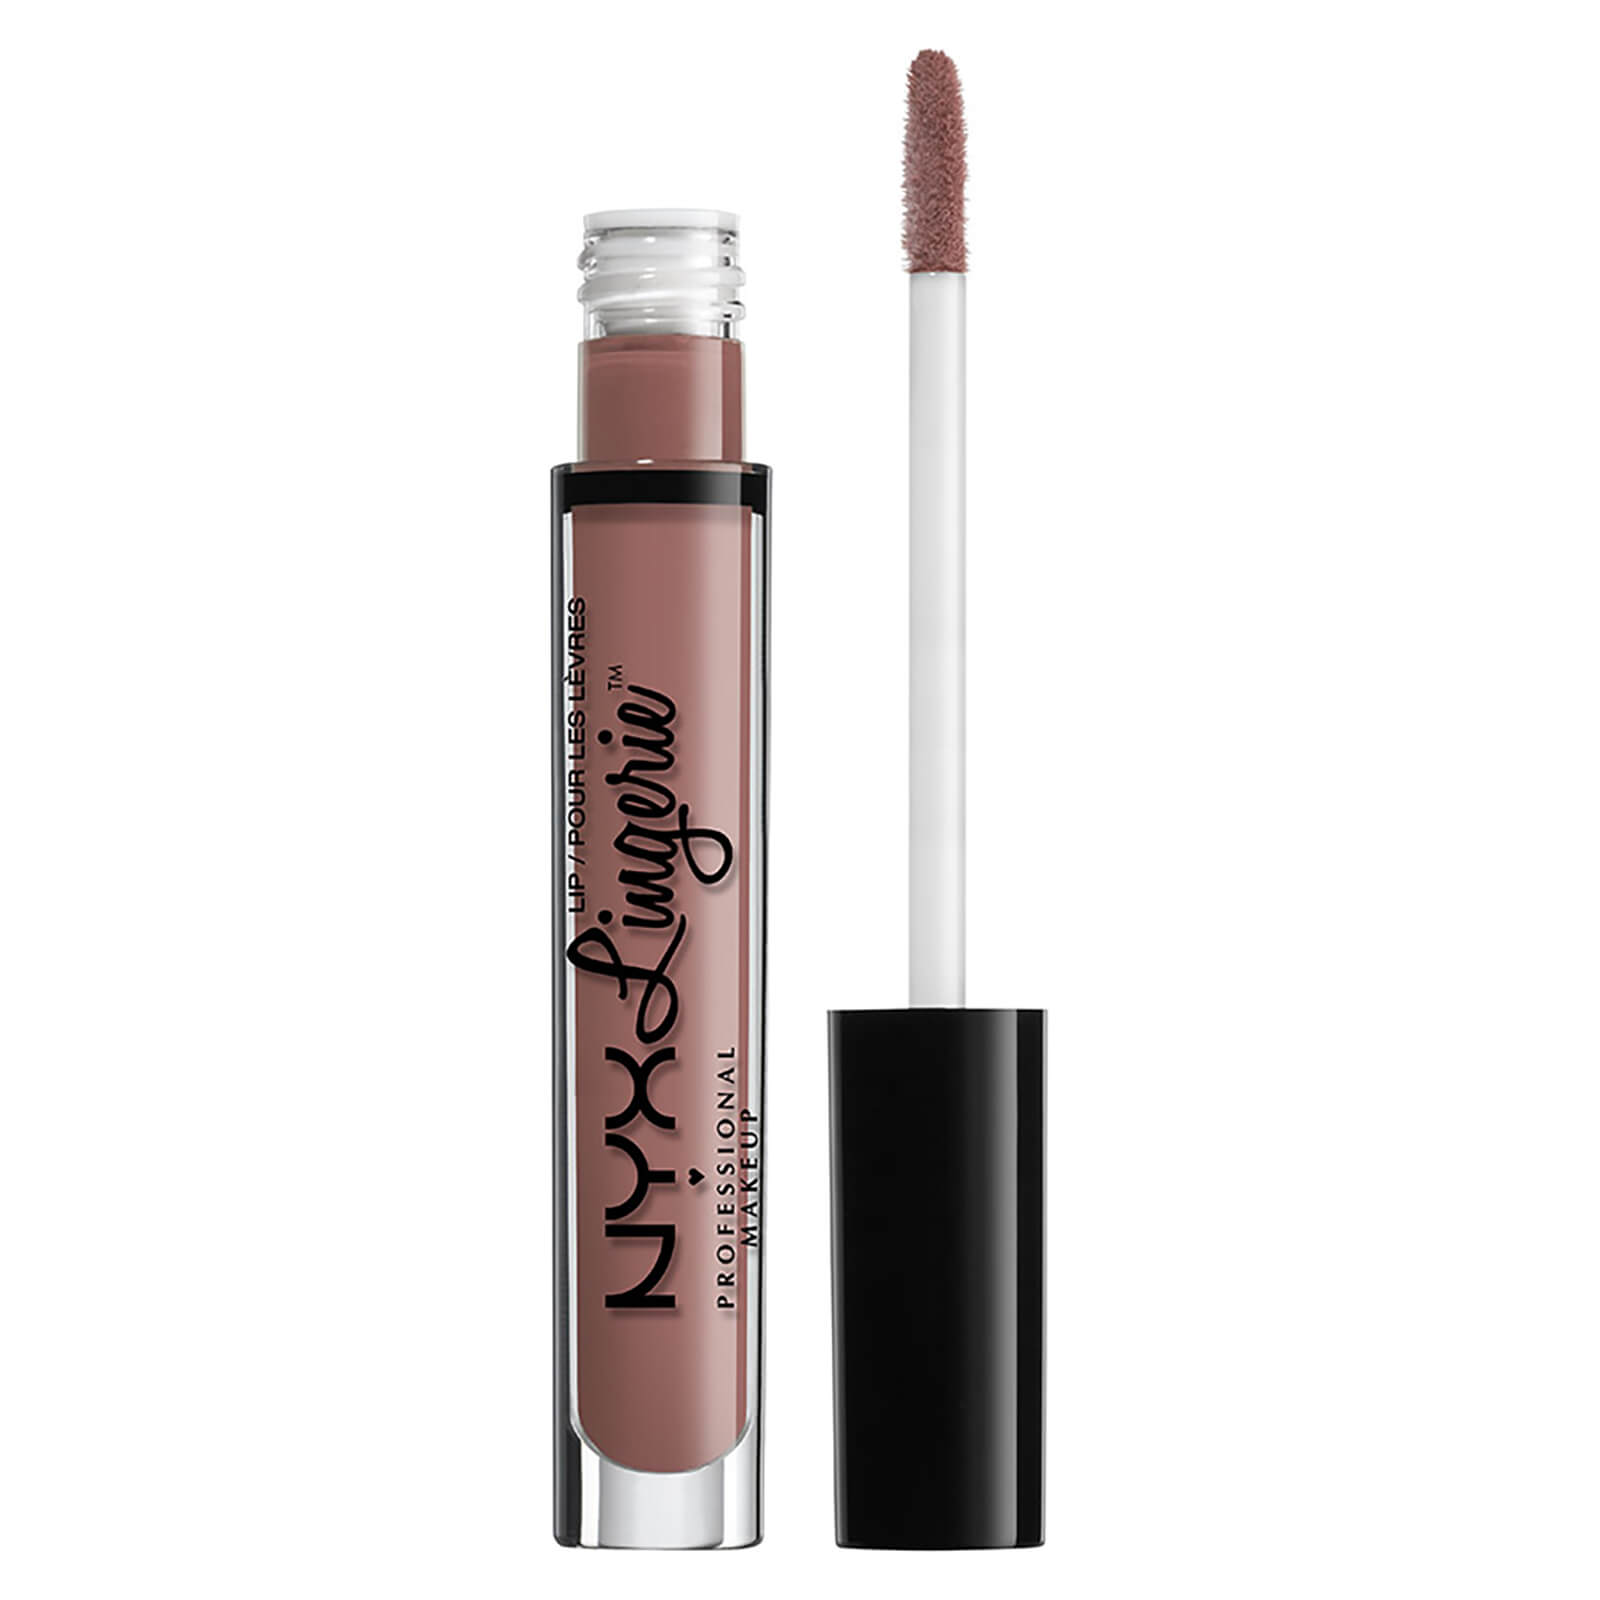 nyx professional makeup lip lingerie liquid lipstick (various shades) - bustier